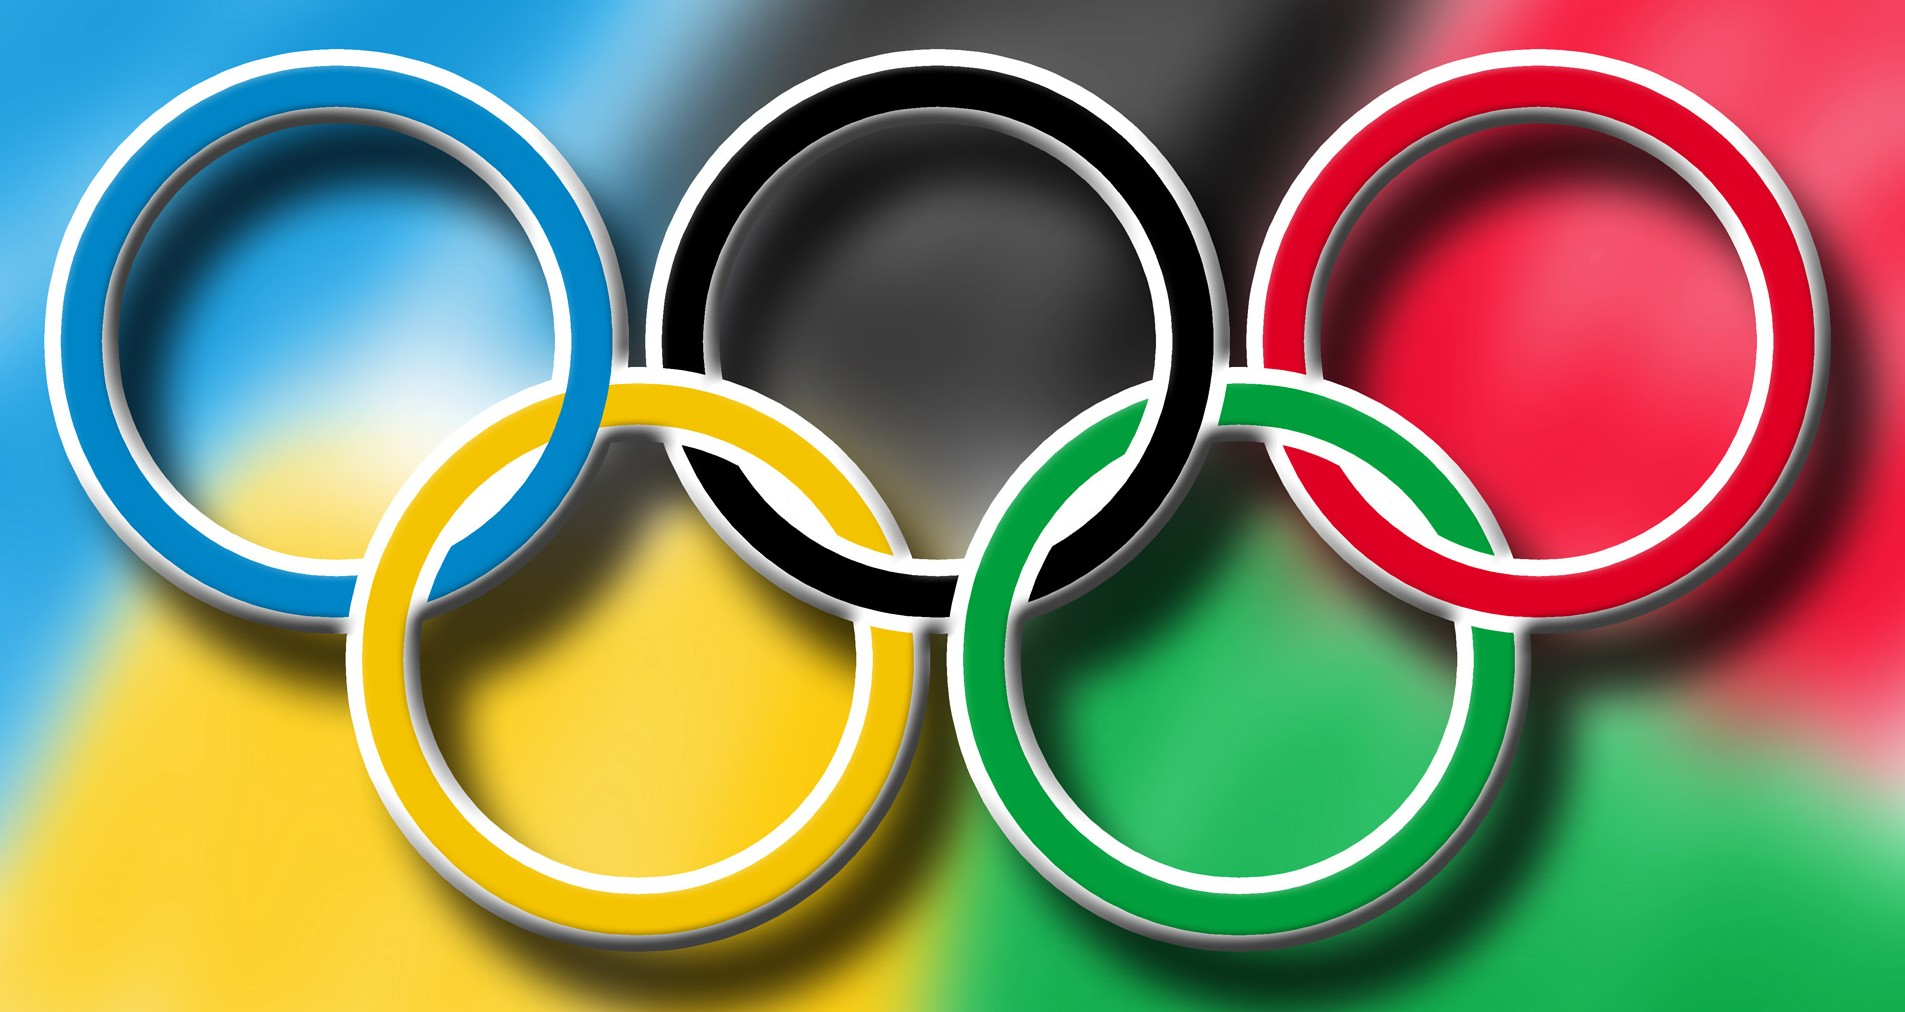 2016 Rio Olympics Games